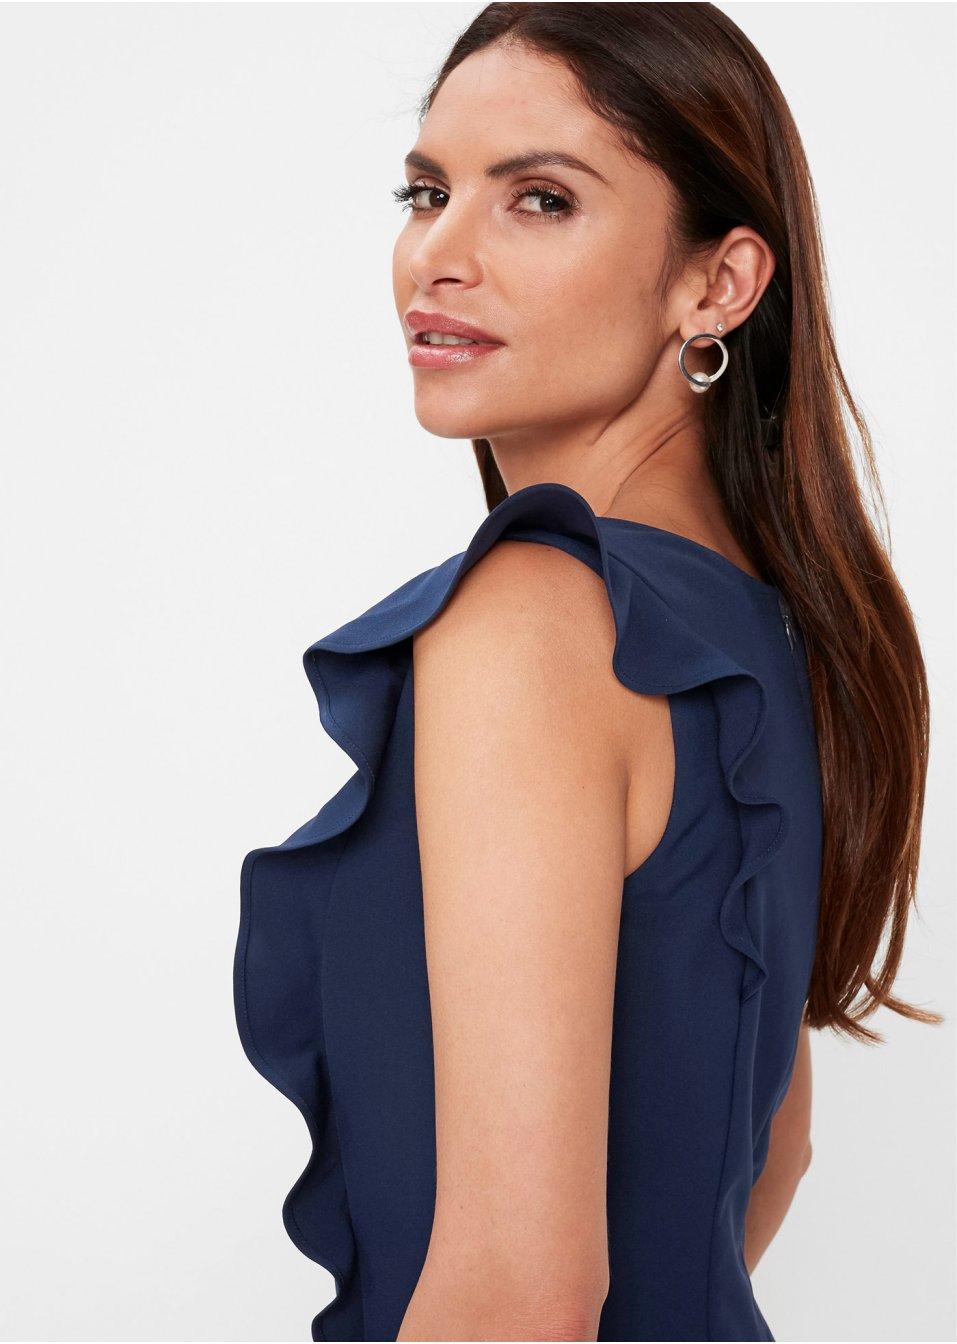 Mode Femme Vêtements DJLfdOFlkj Robe fourreau bleu foncé bpc selection premium acheter online .fr